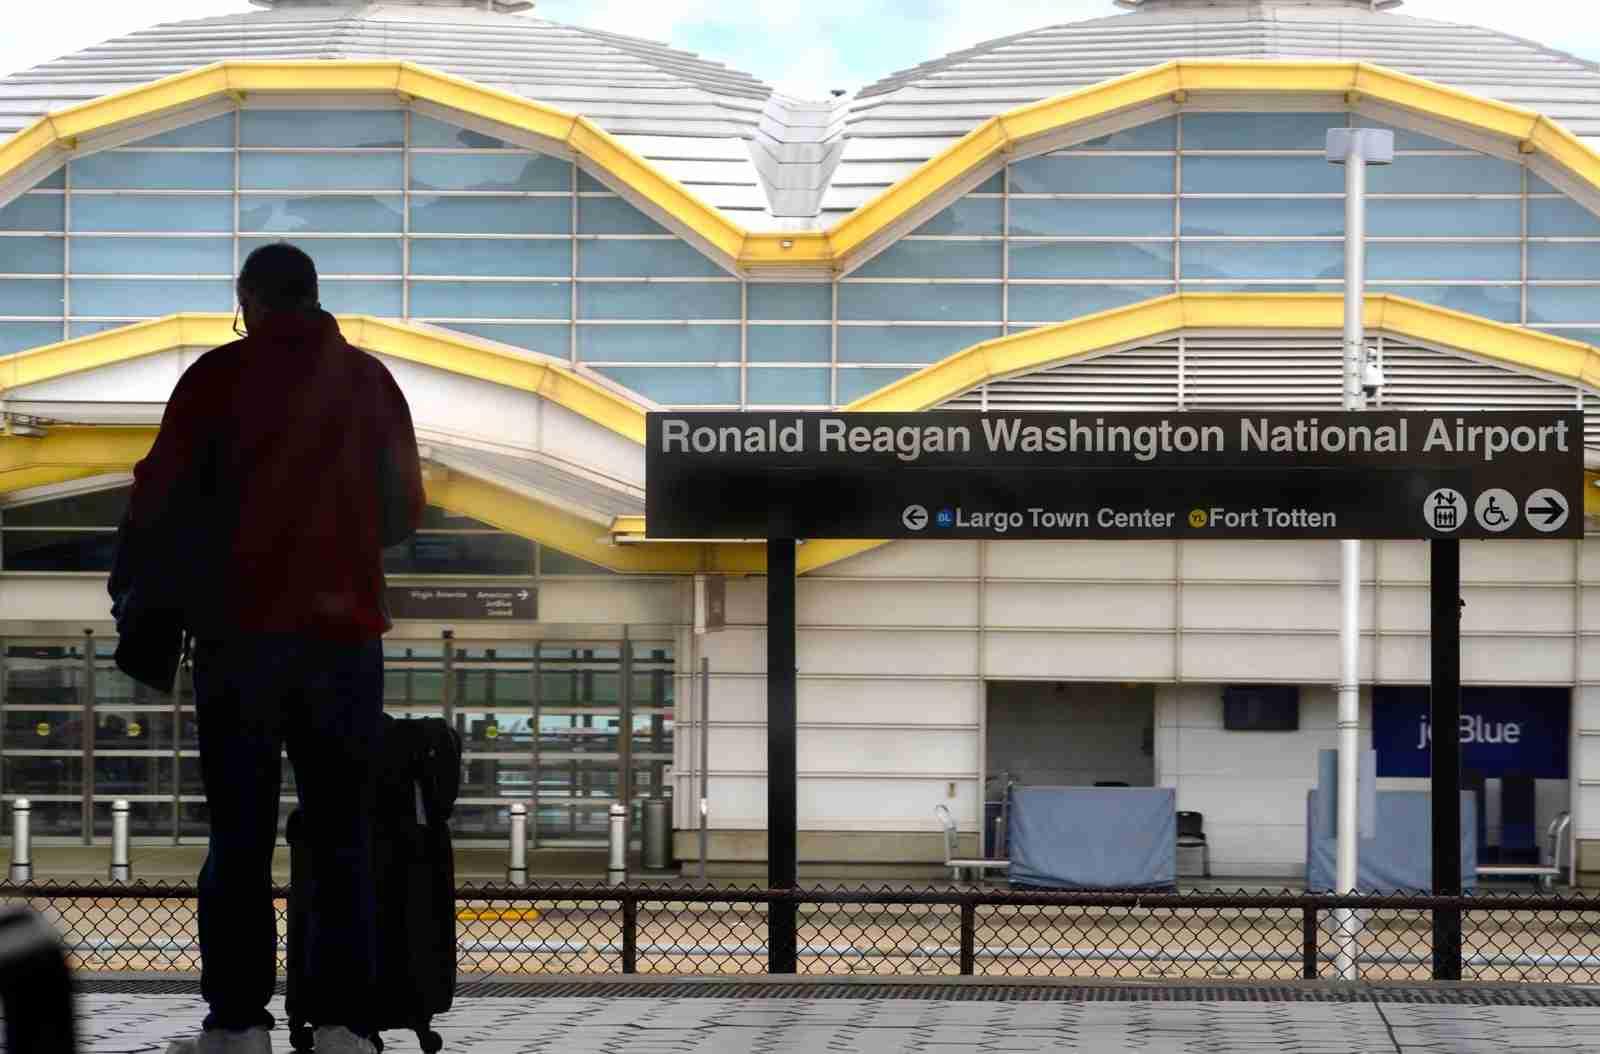 The Metro station at Ronald Reagan Washington National Airport. (Photo by Robert Alexander / Getty Images)